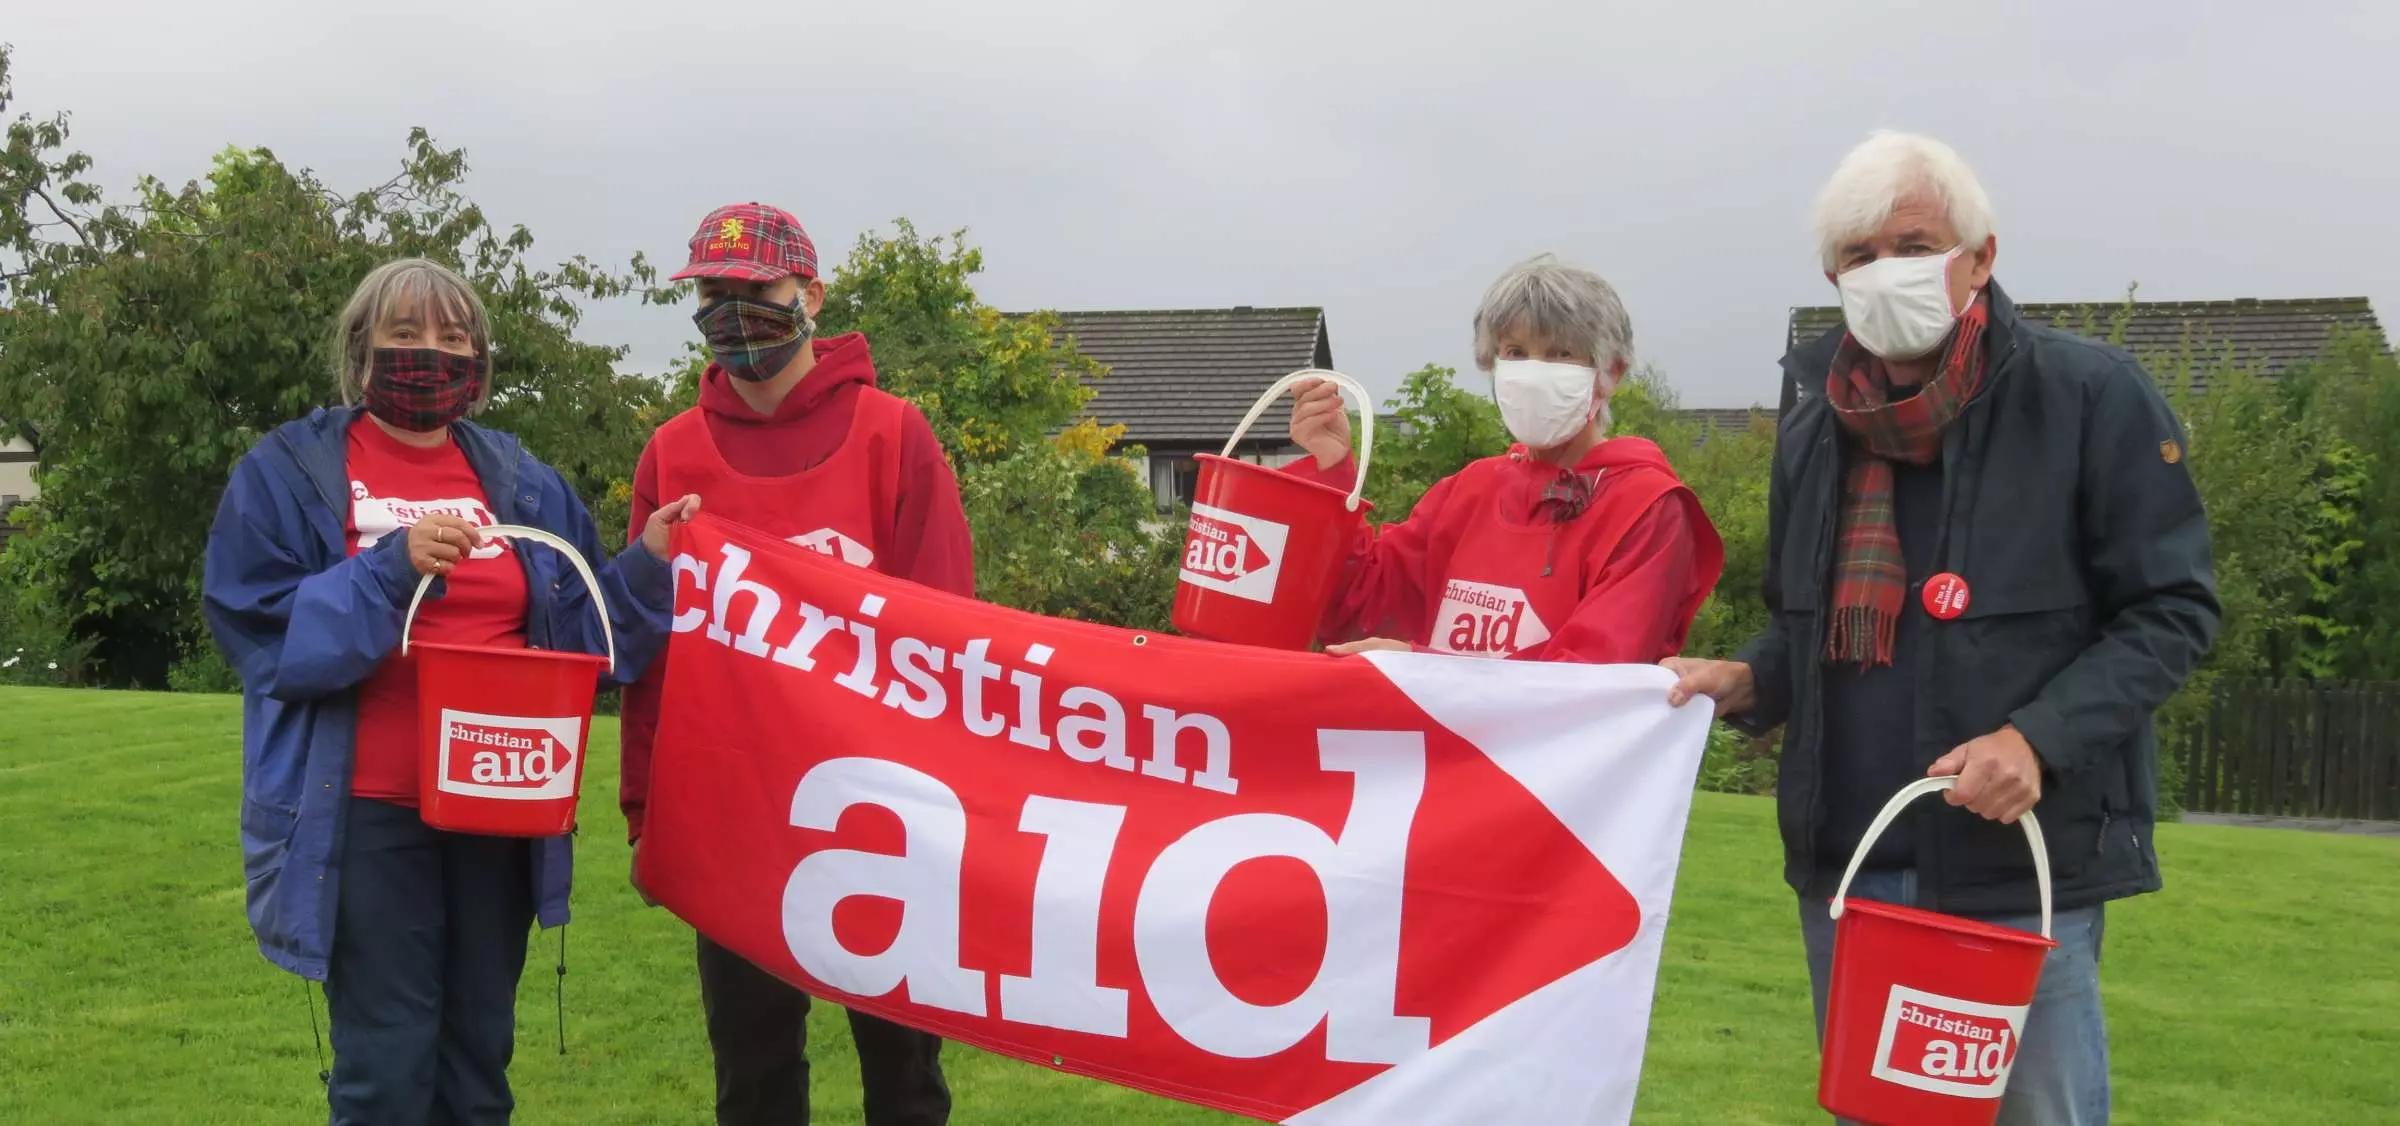 Helensburgh Christian Aid